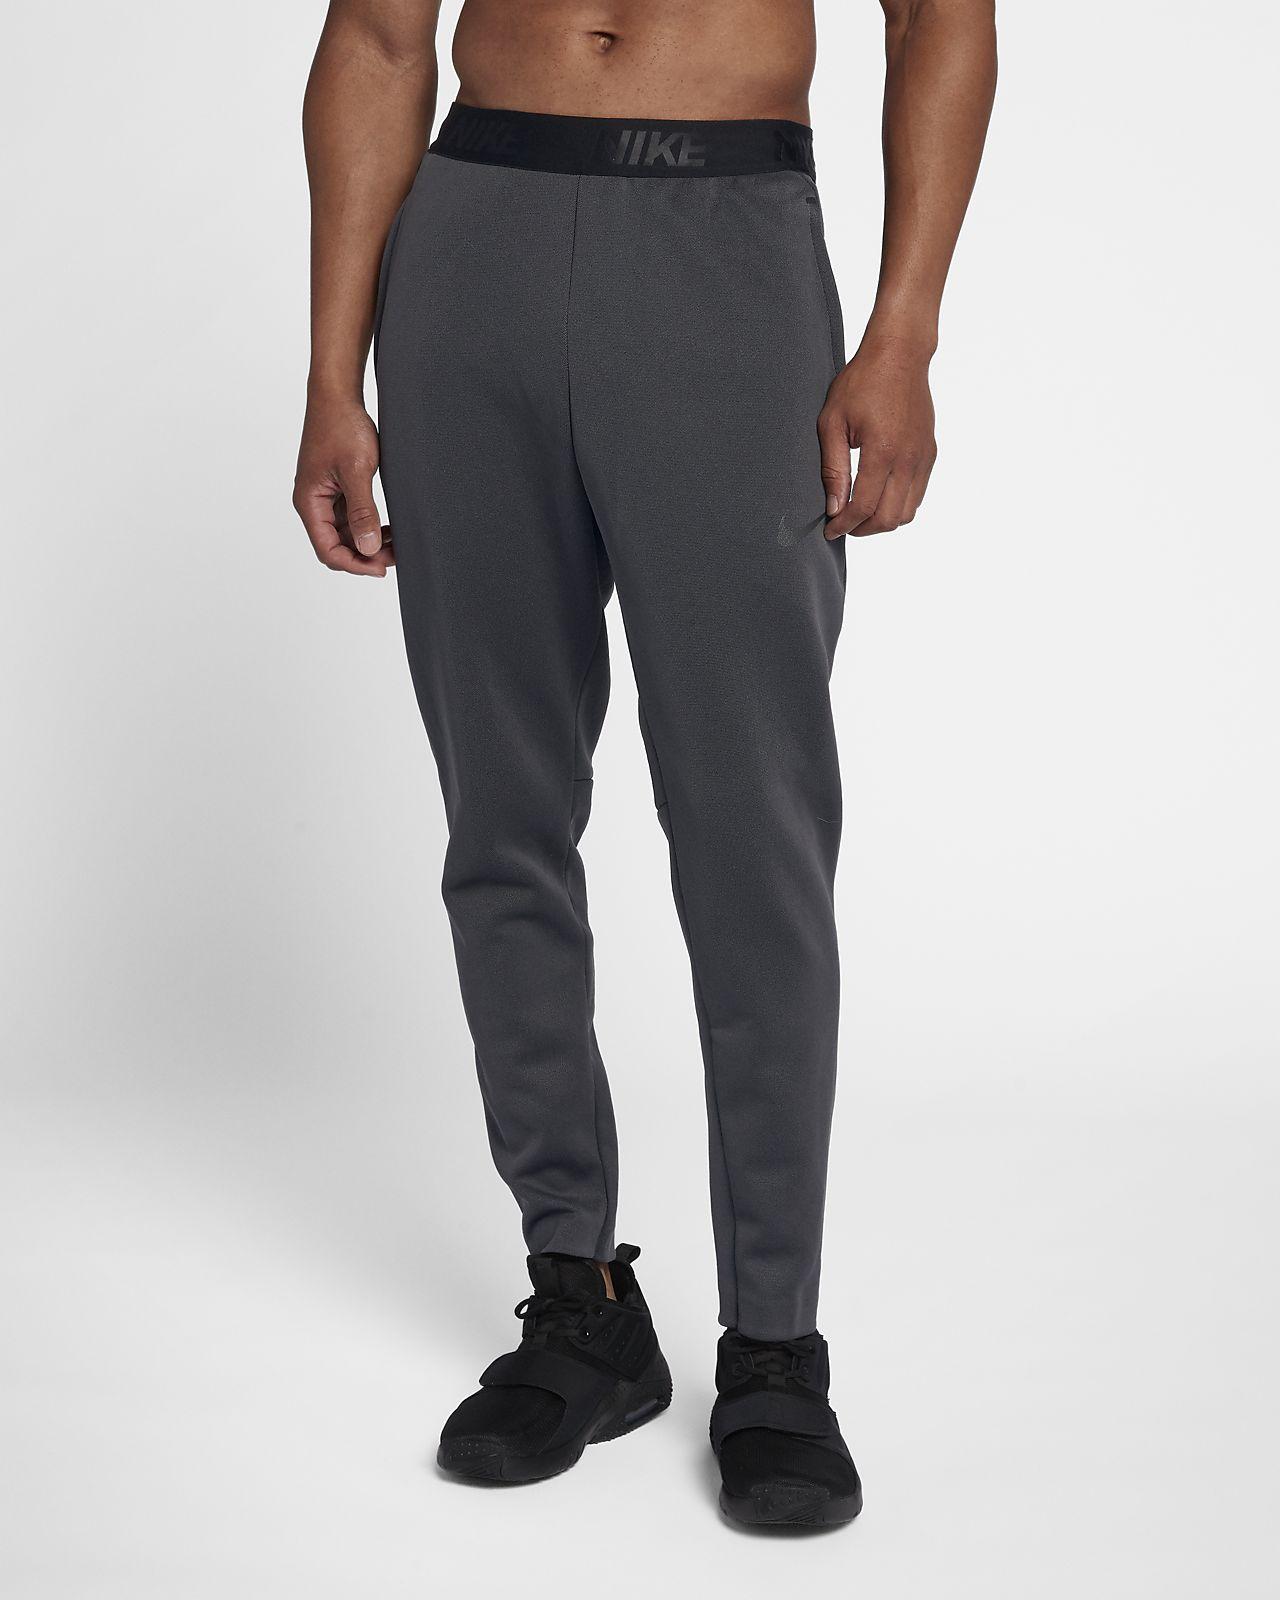 Nike Therma Sphere Max férfi edzőnadrág